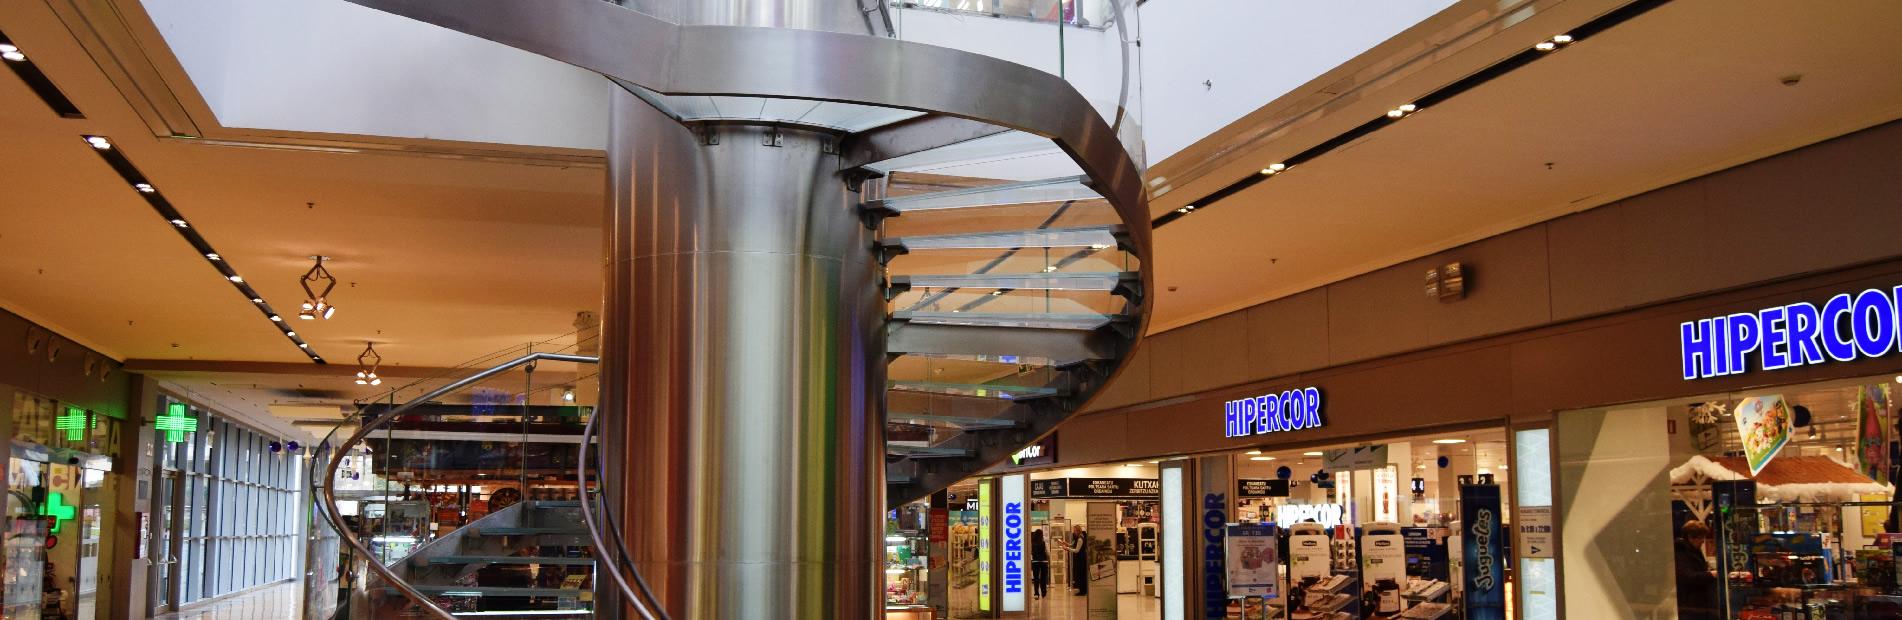 Cianco fabricó e instaló una escalera de acero inoxidable AISI-304 en el centro comercial Itaroa en Pamplona